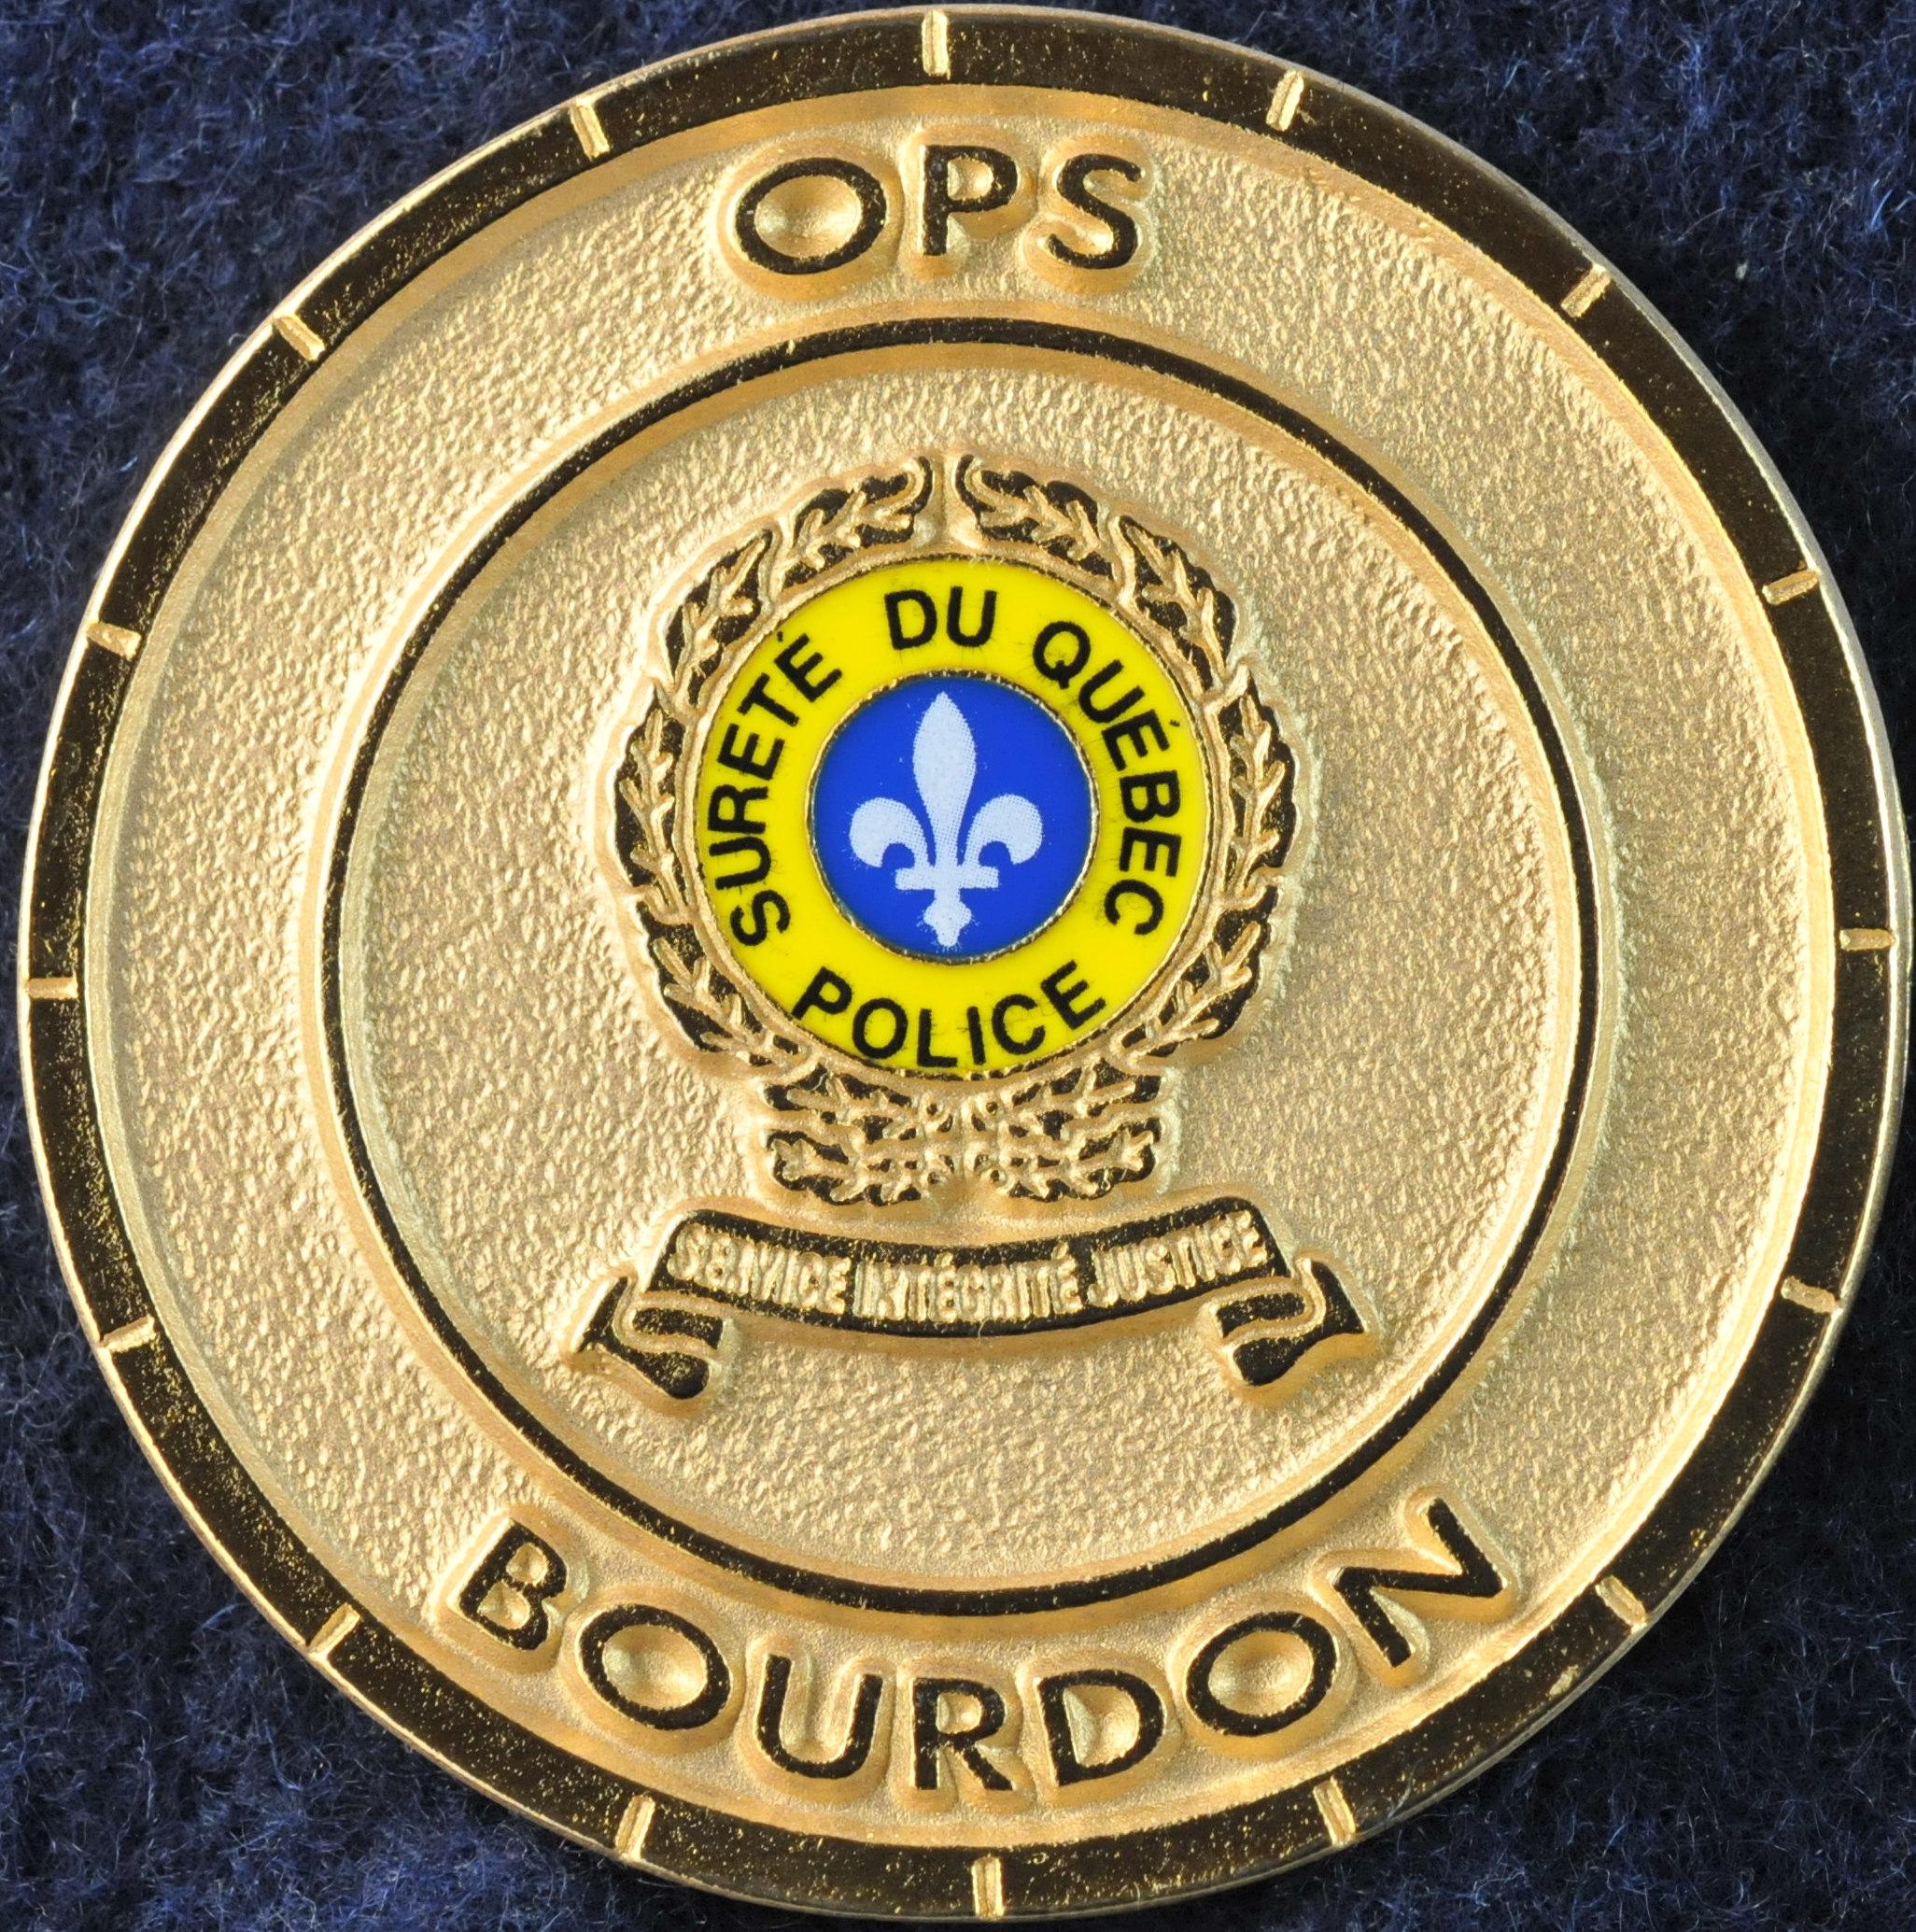 Balun additionally Brassards Imprimes 11 30 Kg Id 8335526 also Attentats Terroristes Historique Groupes in addition Lorry park facilities portsmouth m27 also Surete Du Quebec Lac Megantic. on surveillance ca…